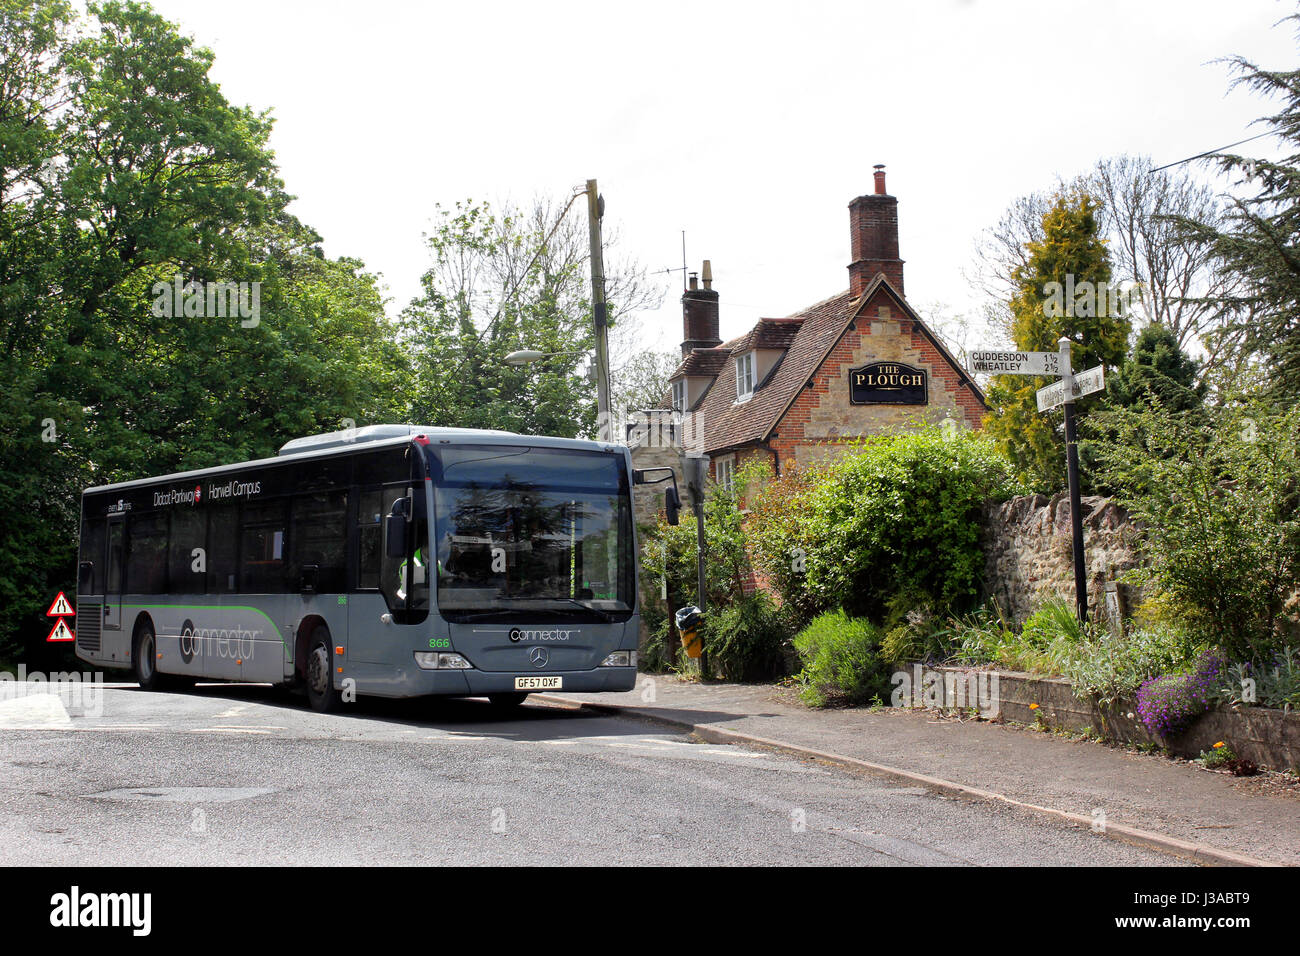 Local bus stopped outside The Plough Inn, Garsington Village, Oxford - Stock Image